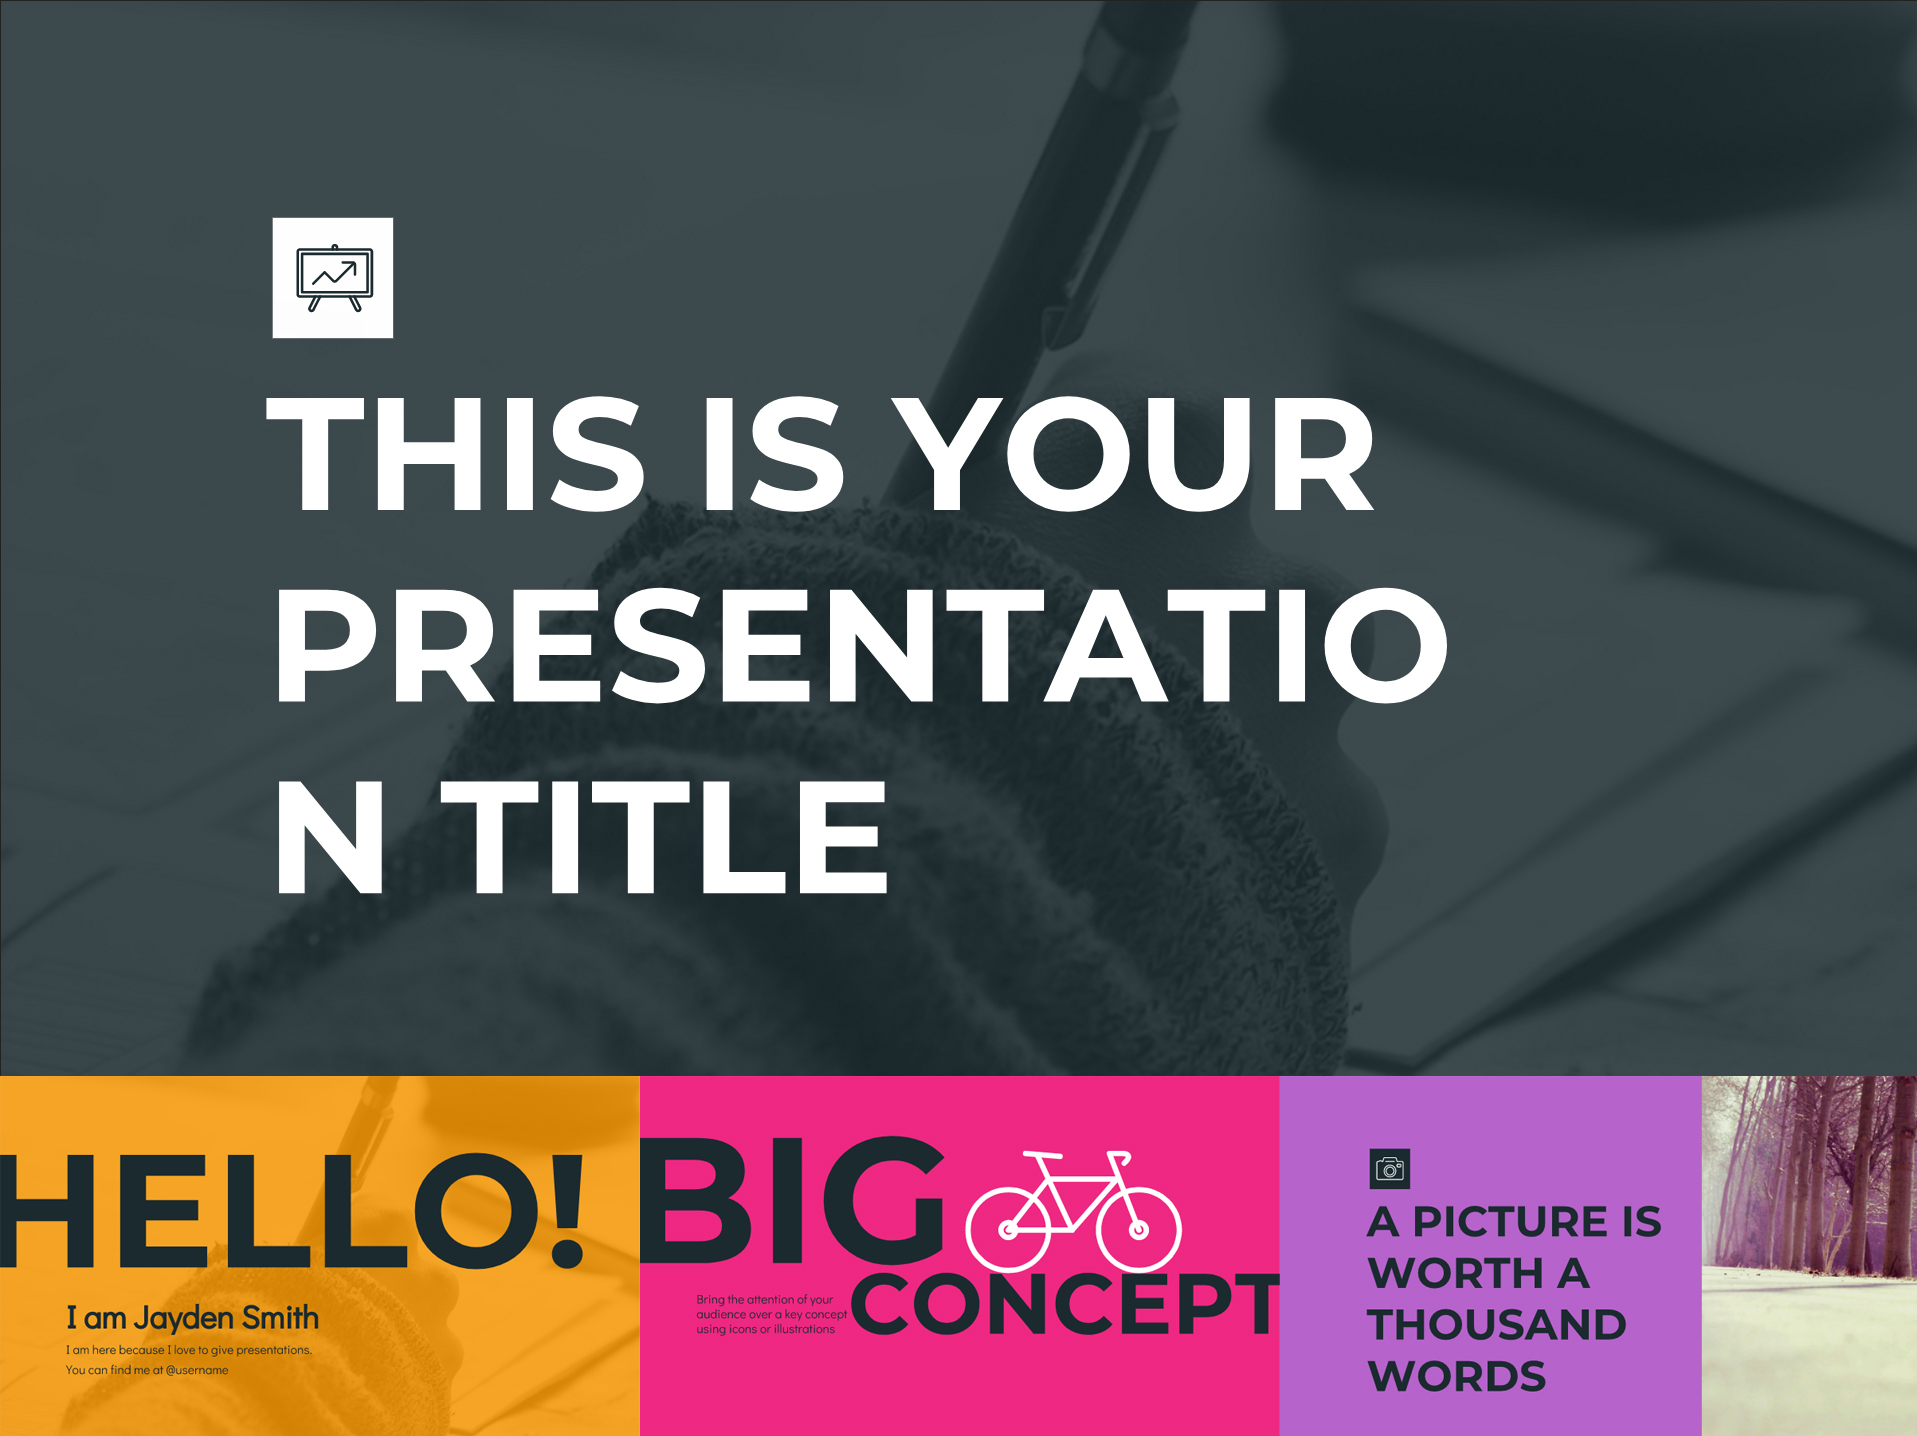 Rainbow Google Slides Templates Presentation - The Internet Tips